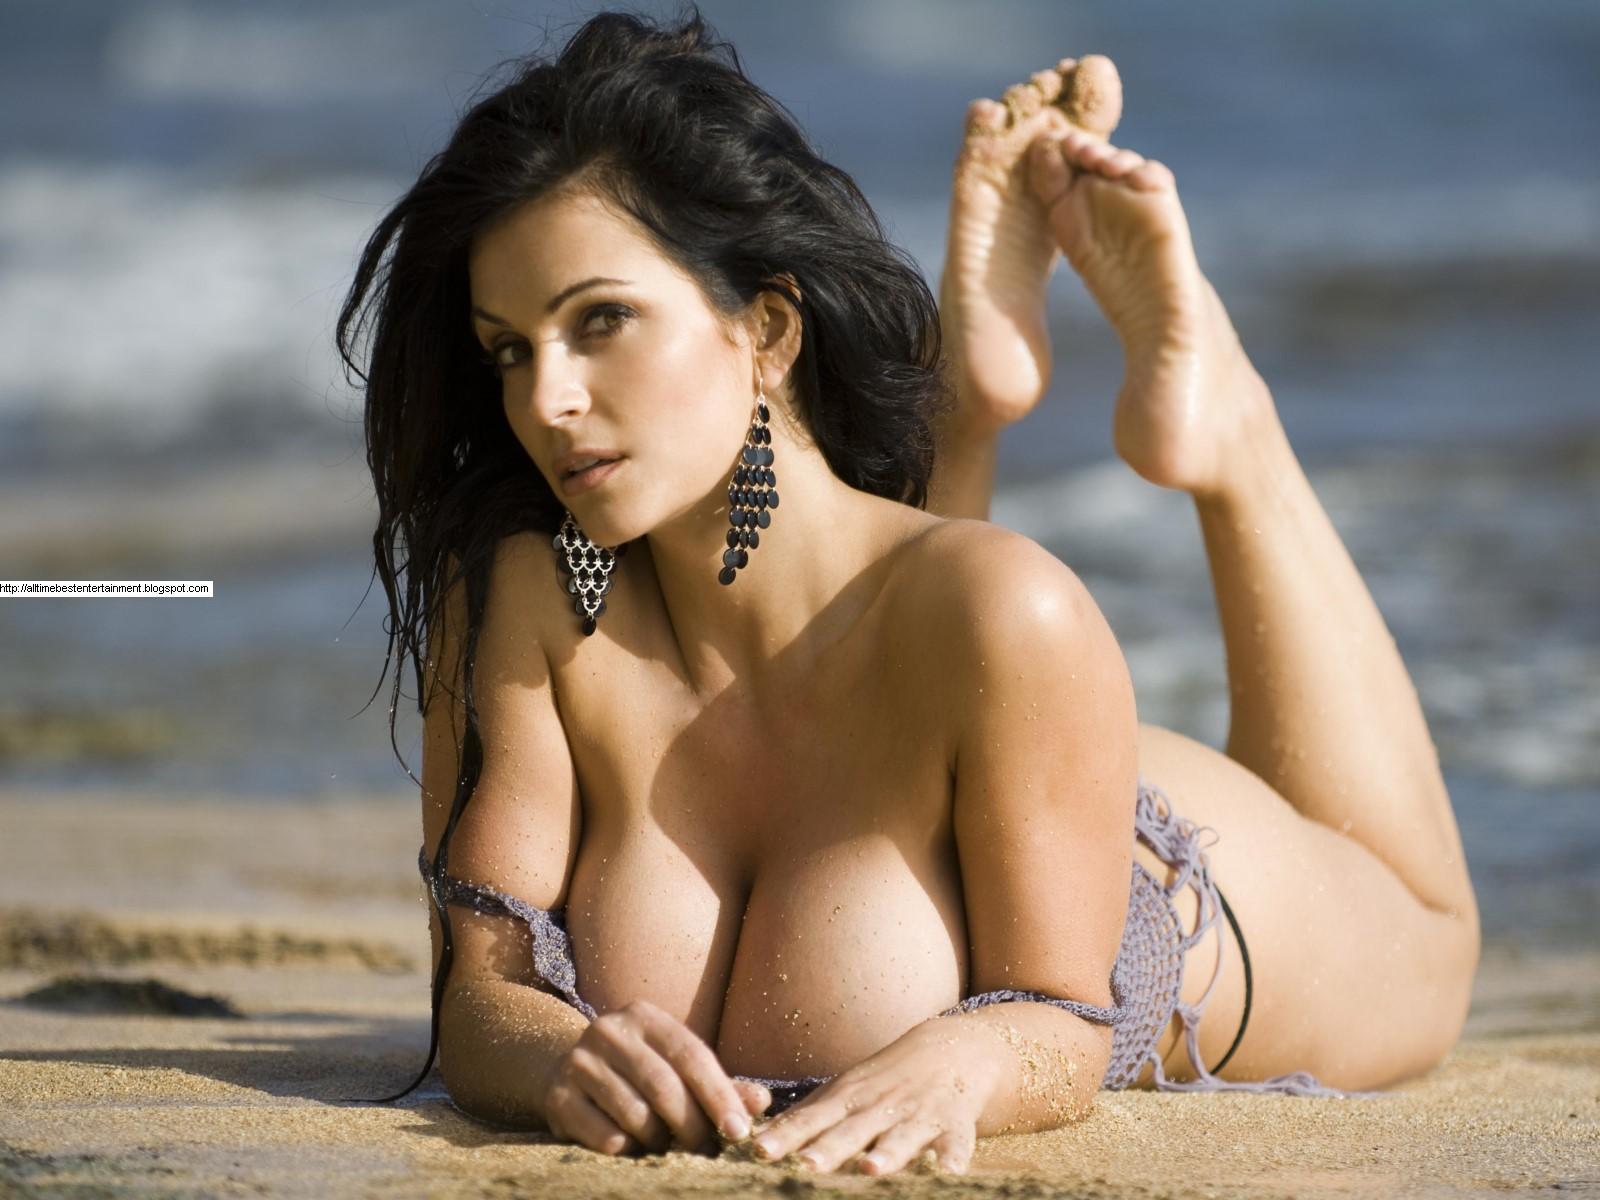 http://4.bp.blogspot.com/-aL4NvFHxKzw/TfEazAXg5vI/AAAAAAAAAPg/nku4tGtICeE/s1600/Denise_Milani_3486_Wallpaper.JPG